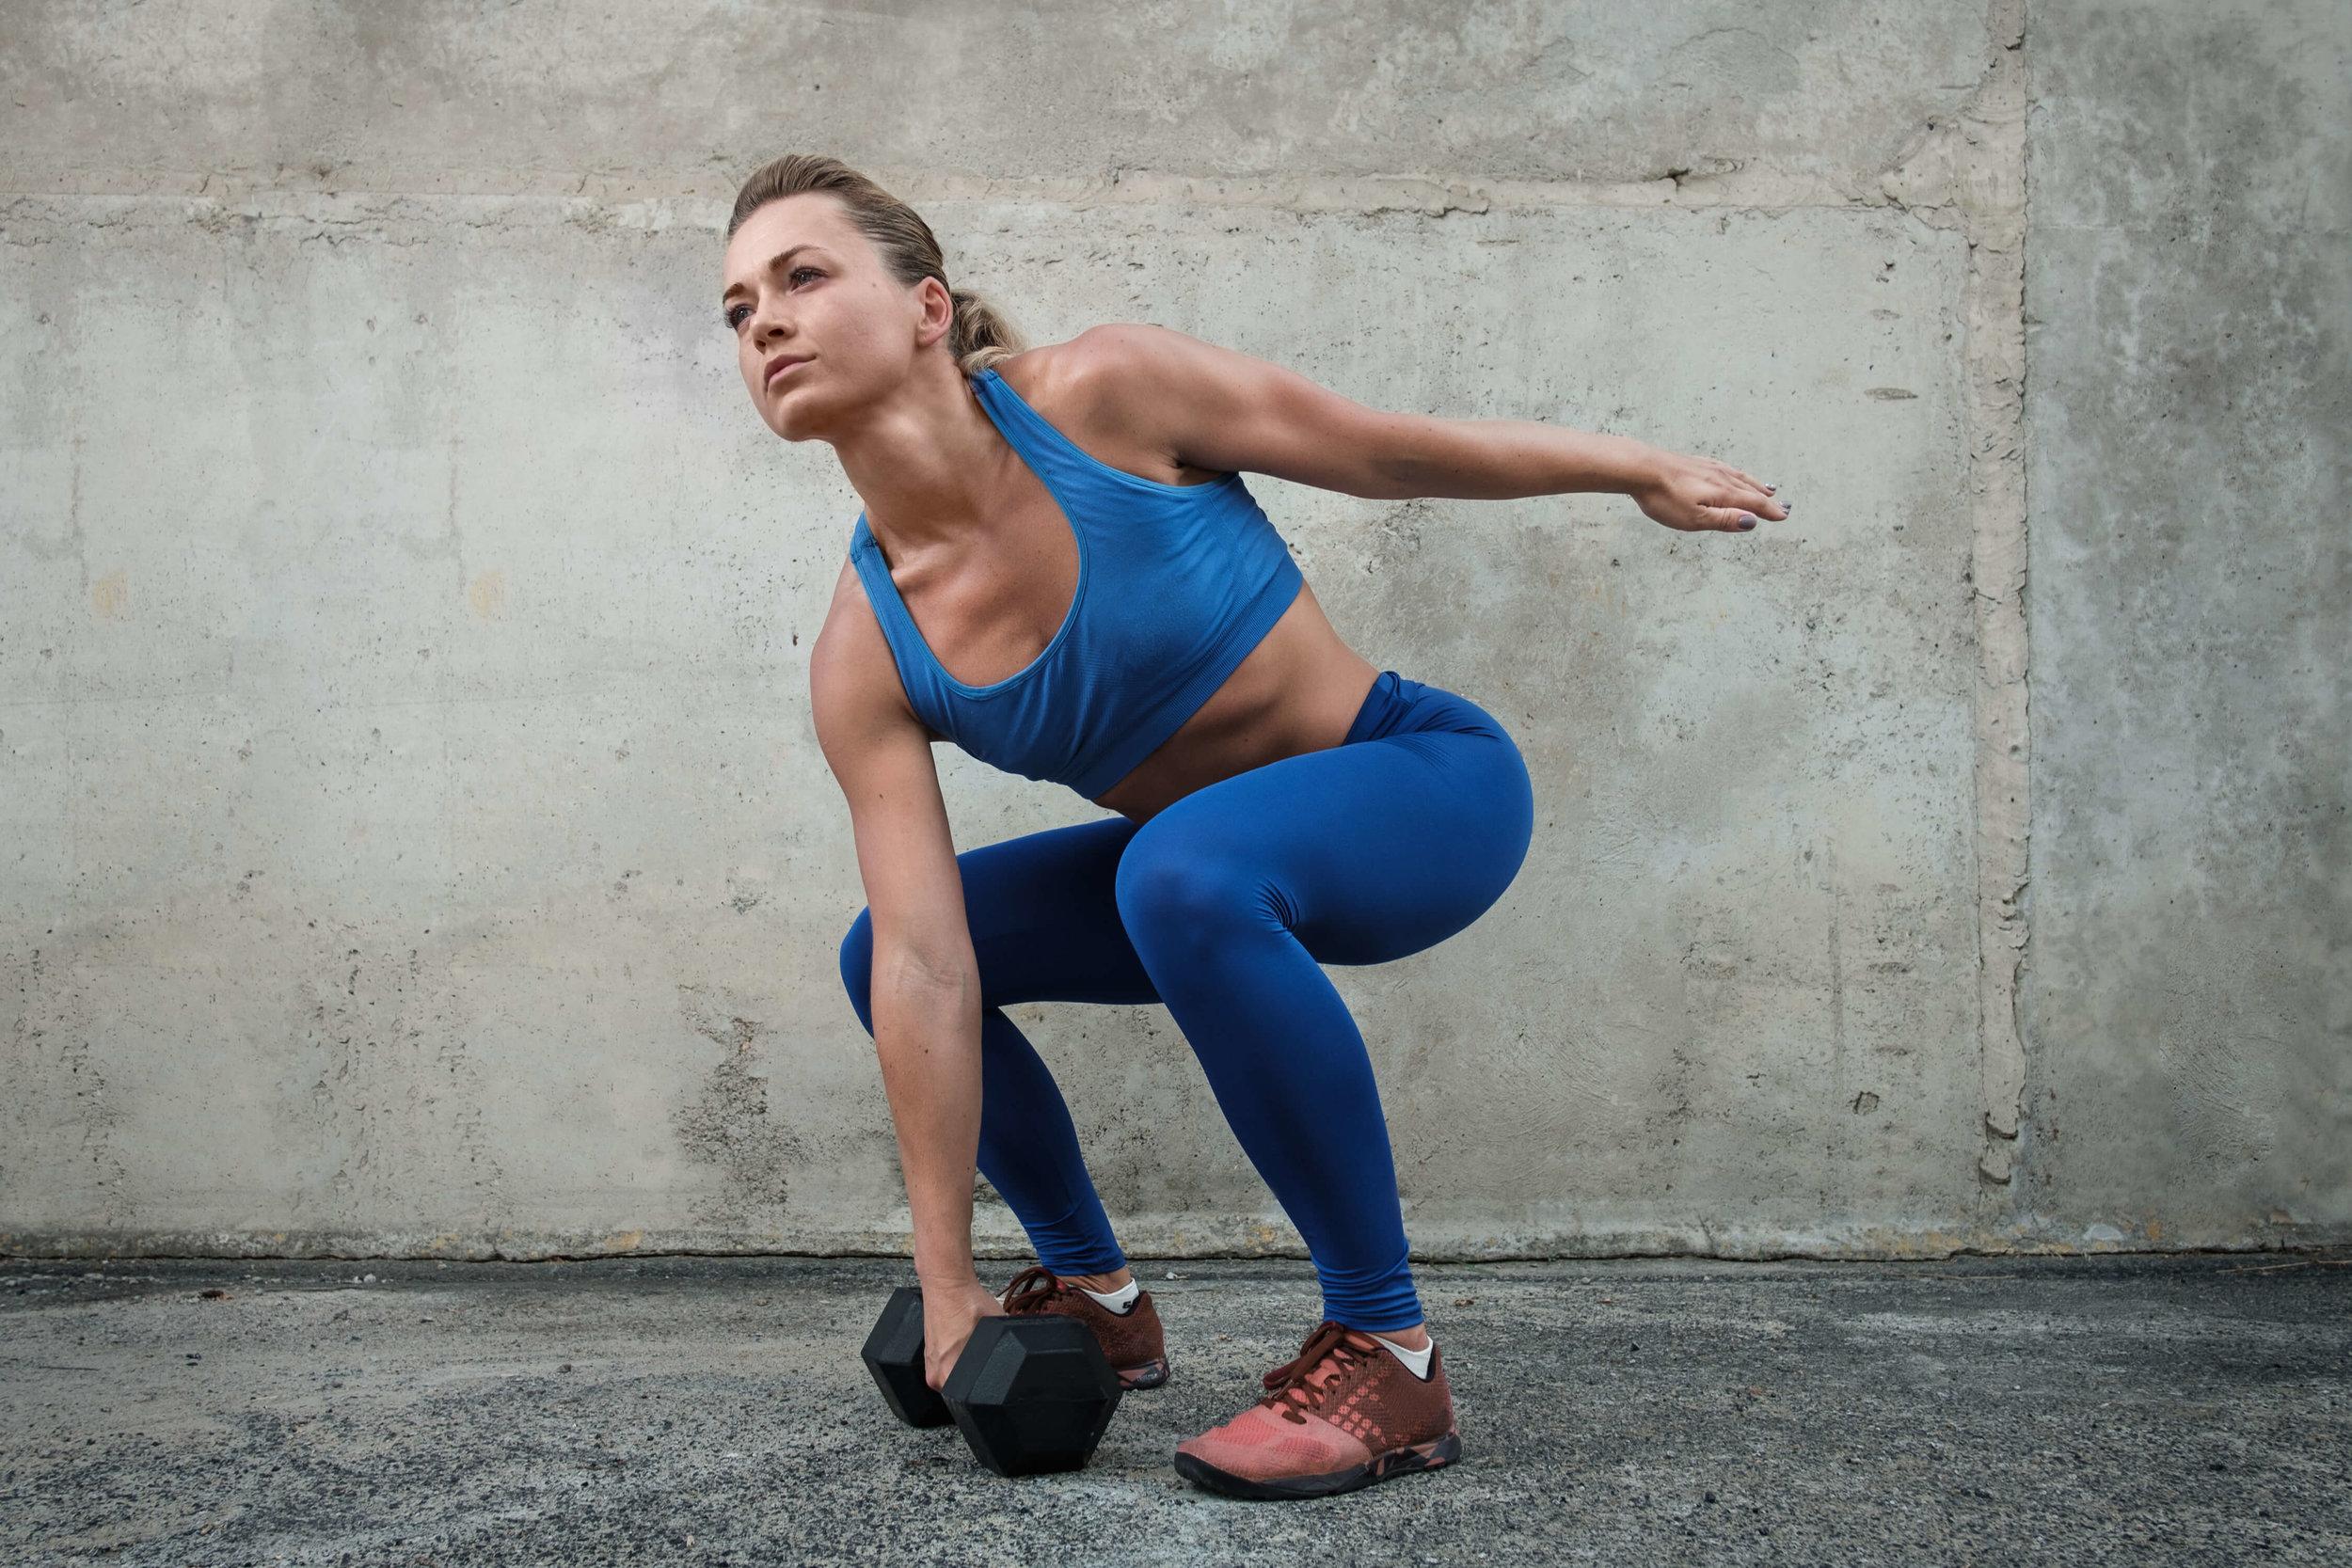 Lean Muscle - Learn More